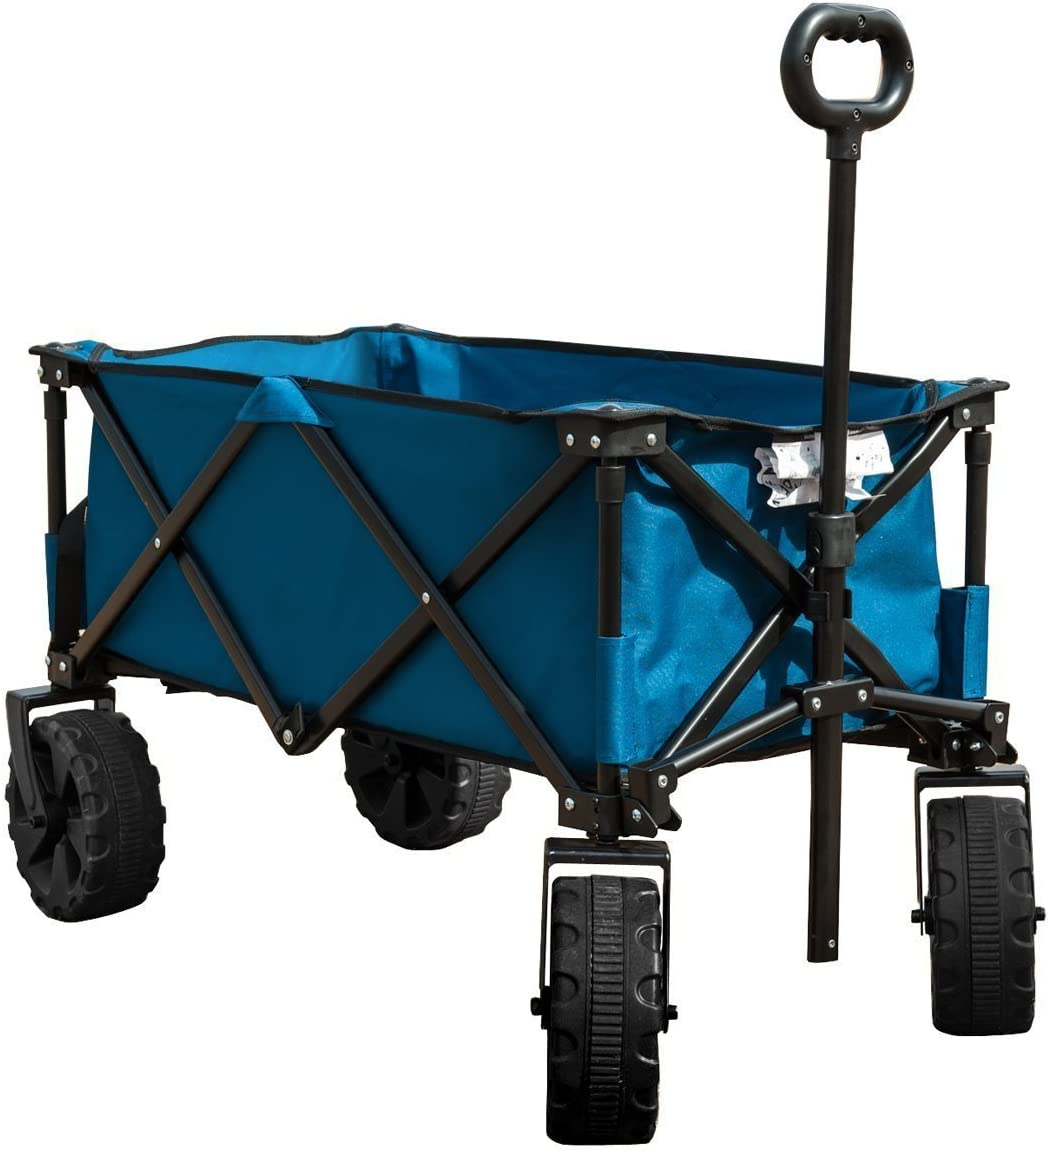 Timber Ridge Folding Camping Wagon Cart – Collapsible Sturdy Steel Frame Garden Beach Wagon Cart